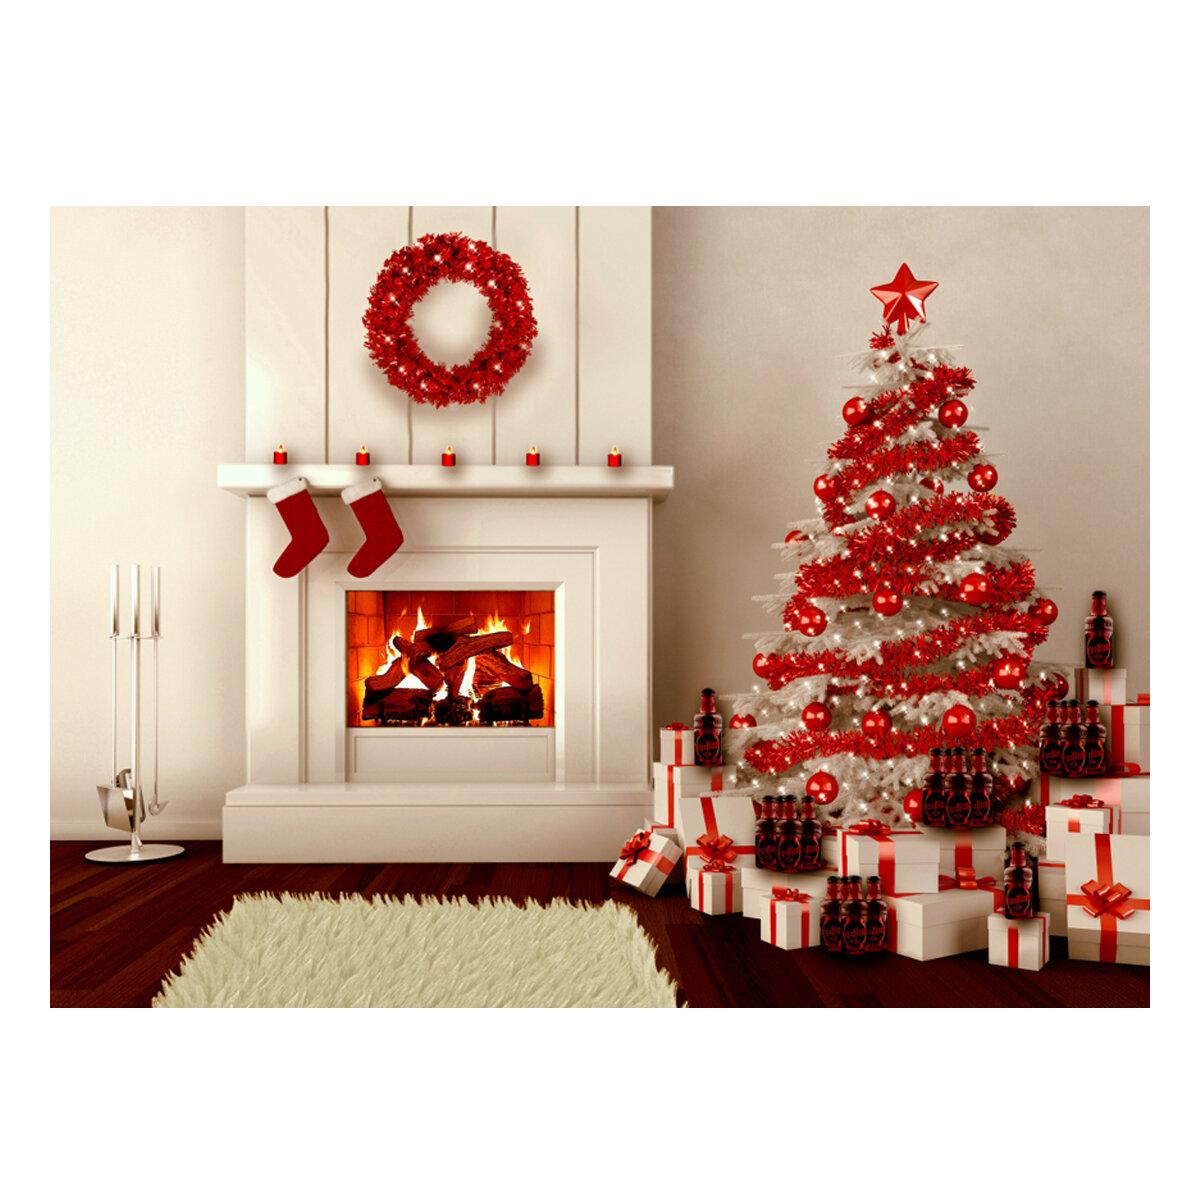 5x7ft Vinyl Christmas Tree Fireplace Gifts Stocking Background Photography Studio Backdrop